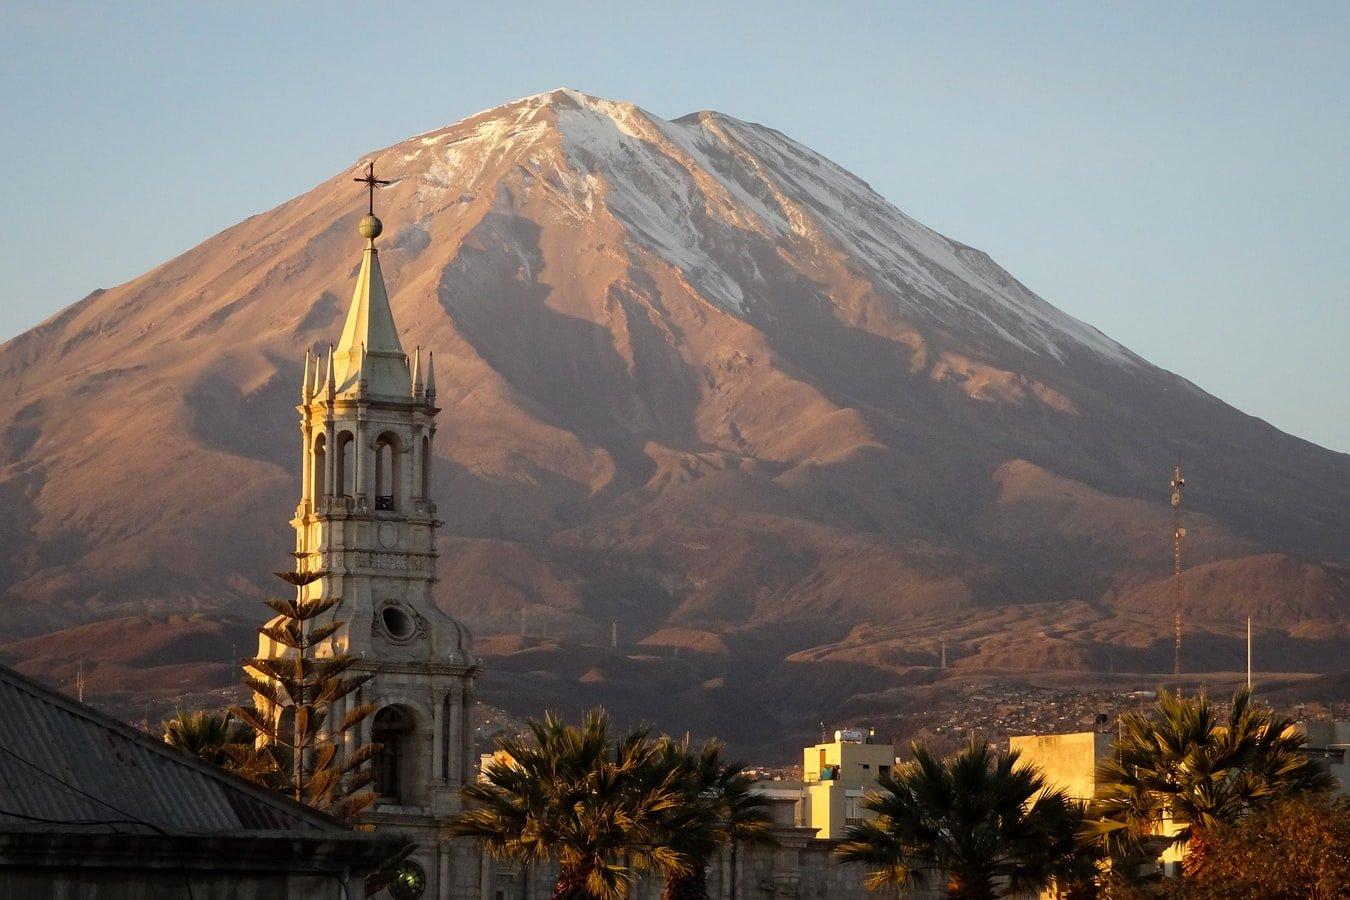 Kathedrale vor Vulkan El Misti in Arequipa Peru